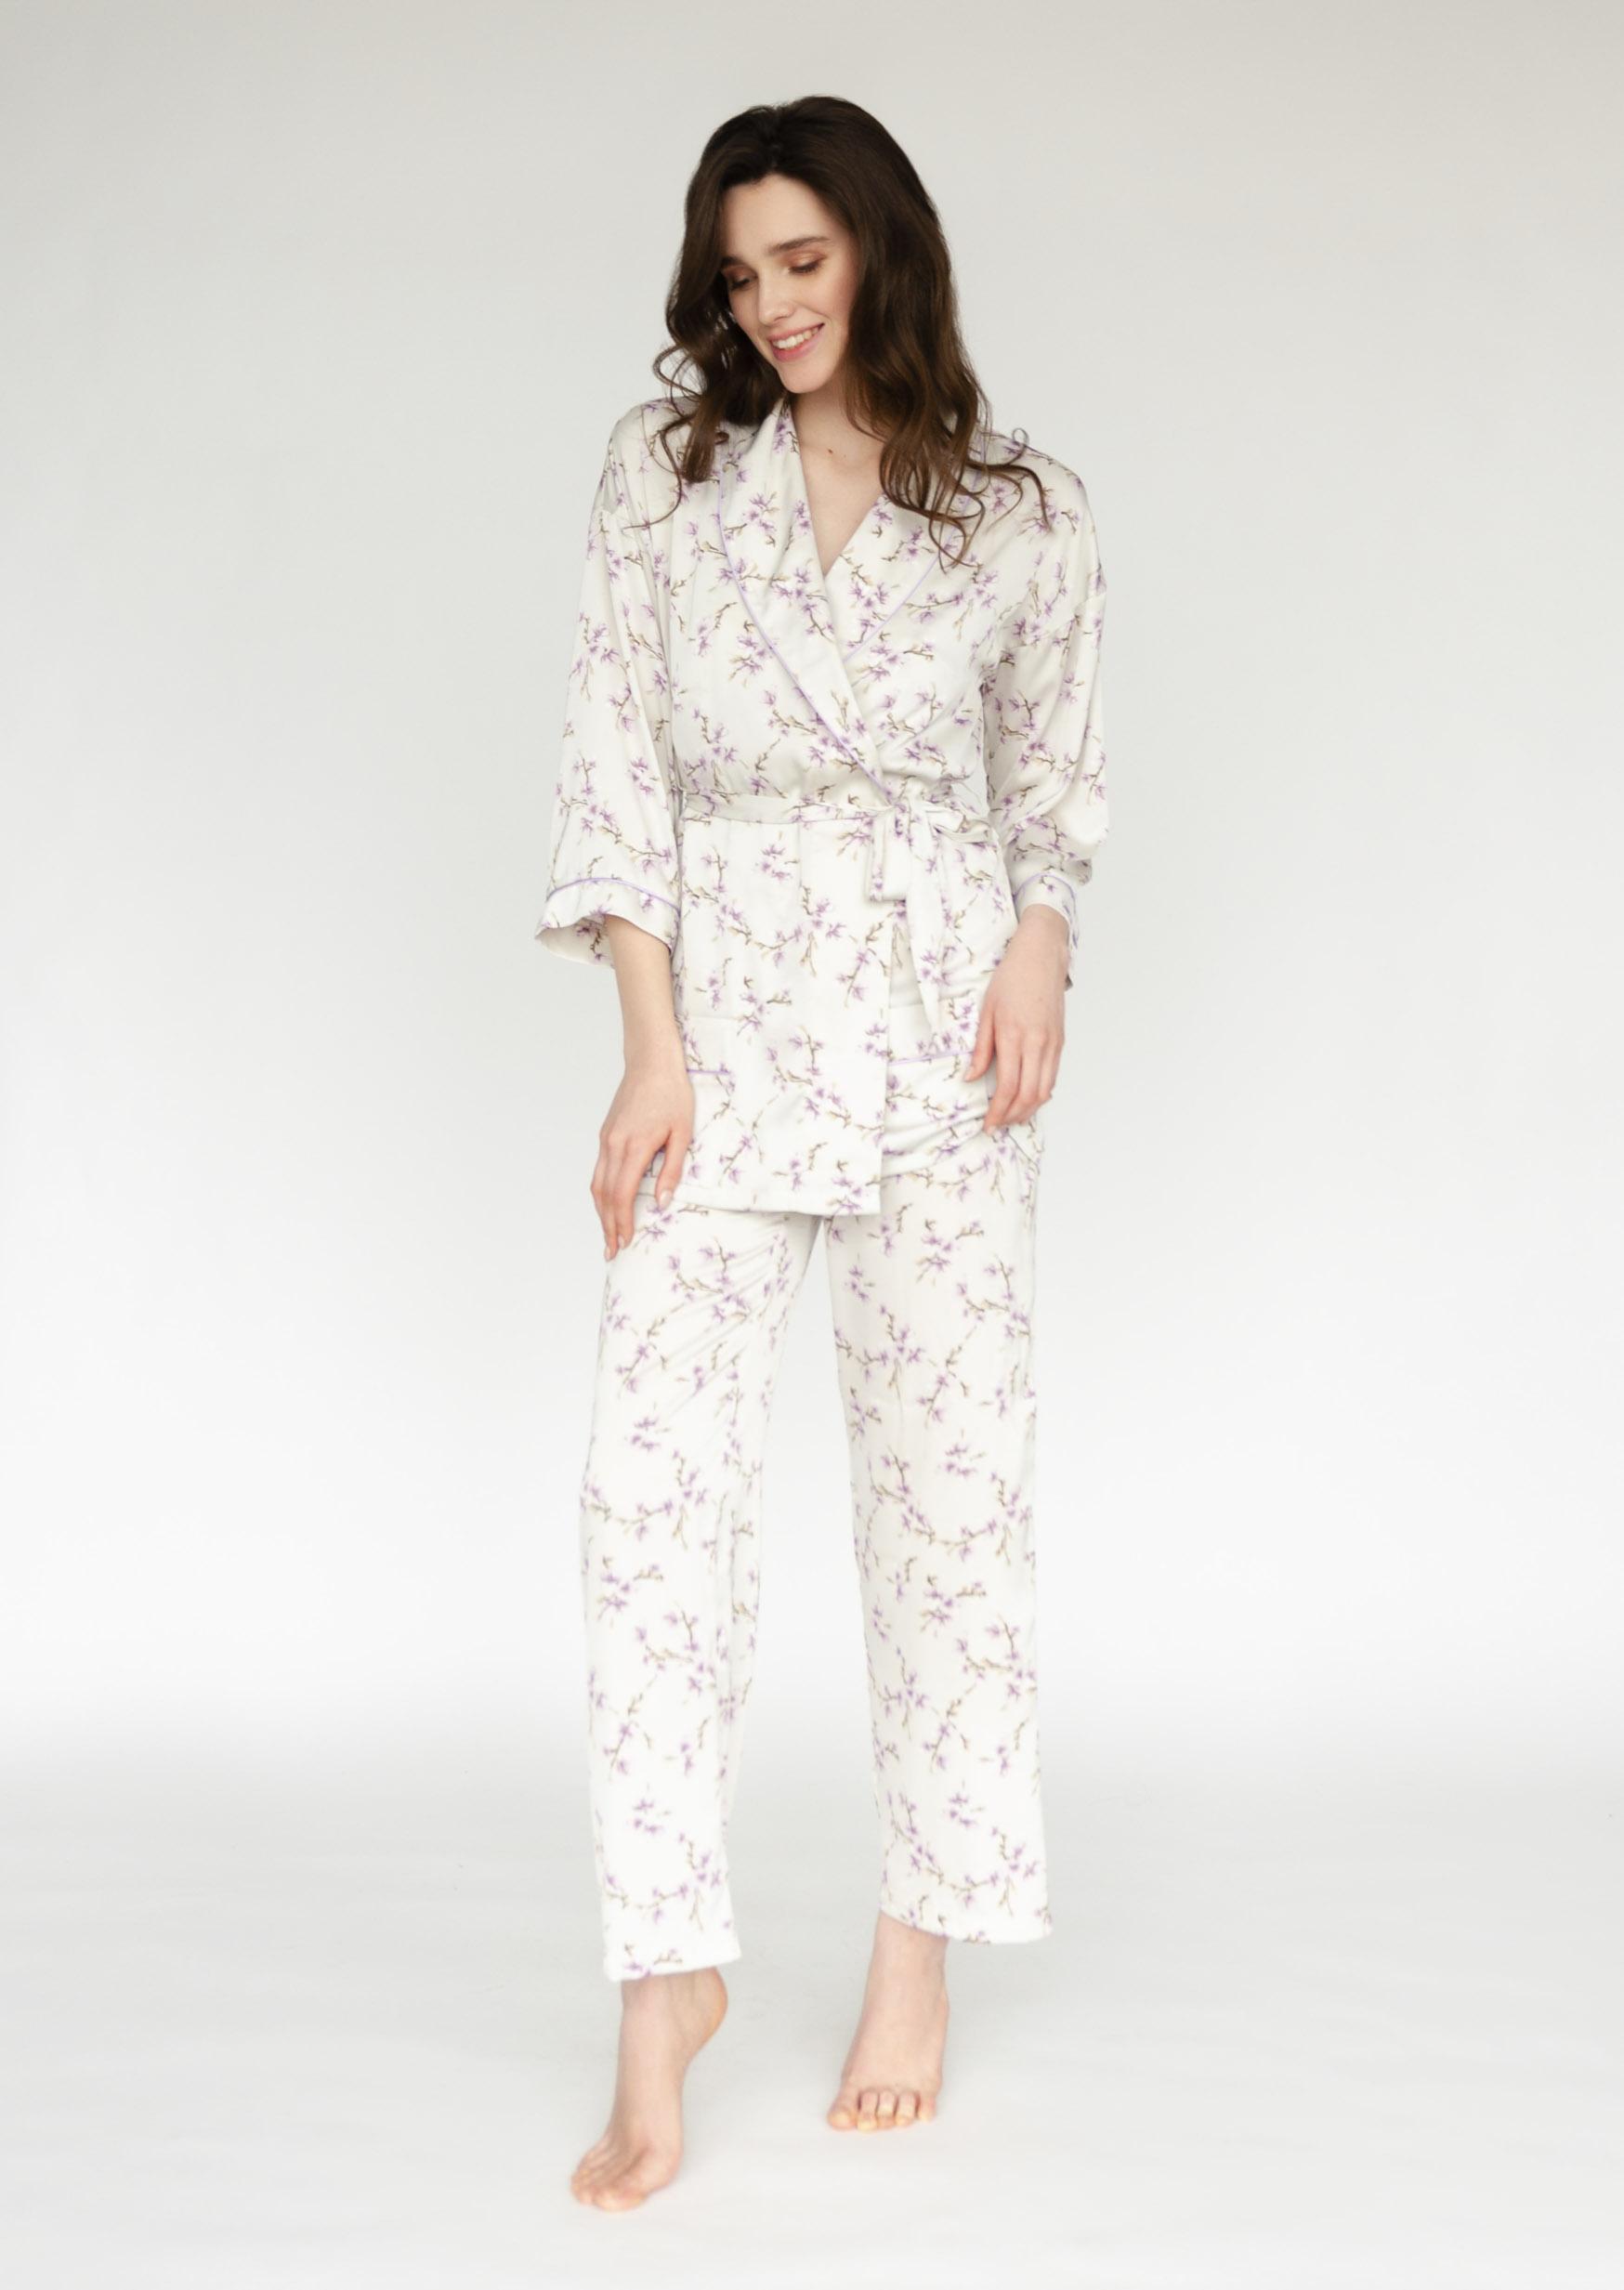 Lavender harmony loungewear set grey elegant satin pattern wear